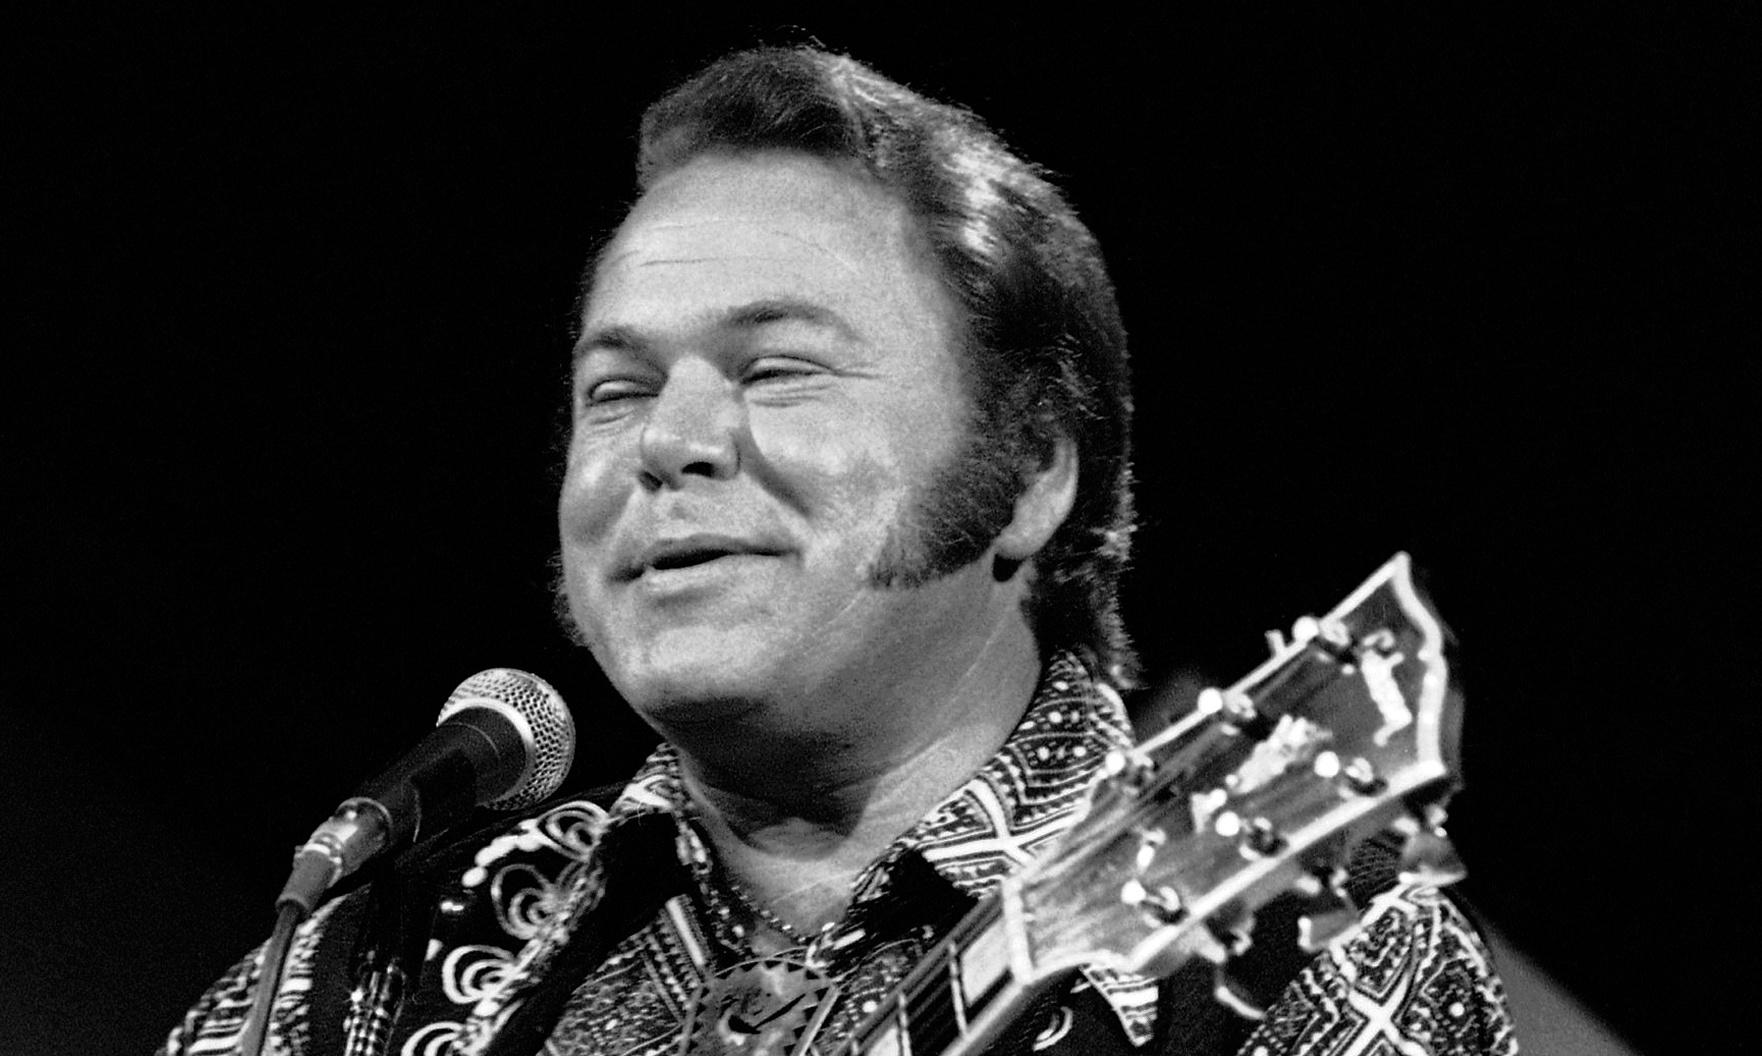 Country music guitarist Roy Clark dies aged 85